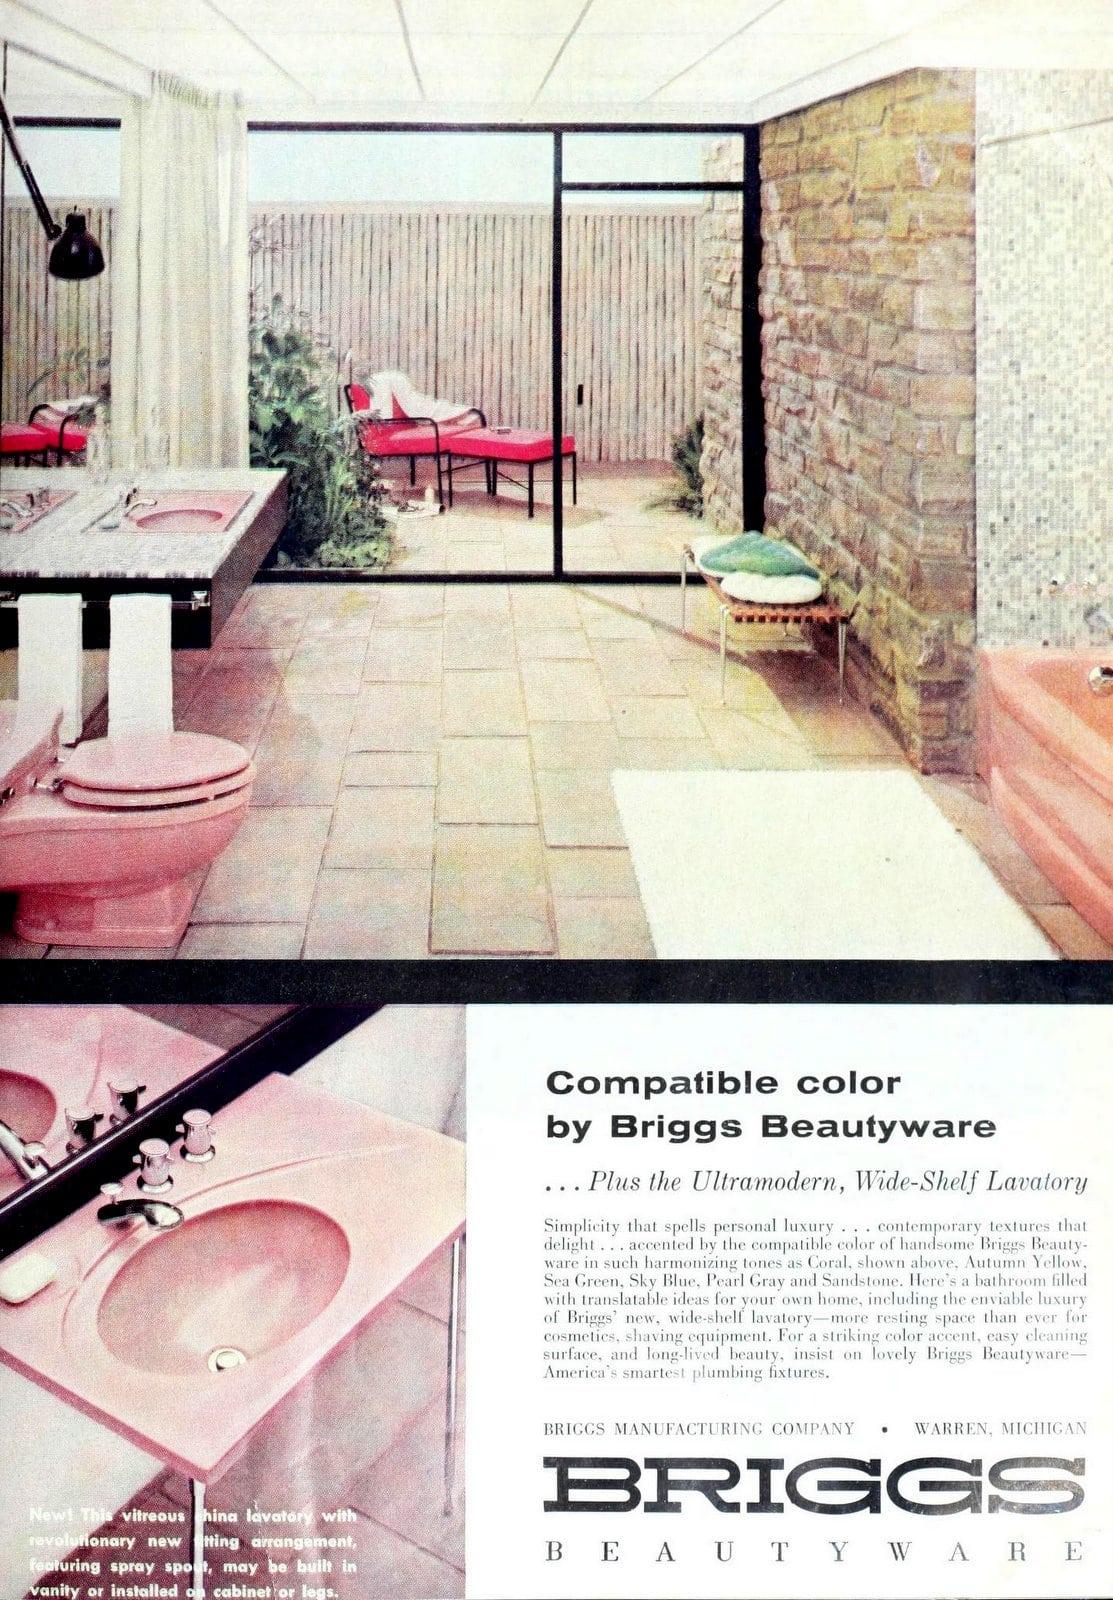 Vintage pink feminine midcentury bathroom suite (1958)